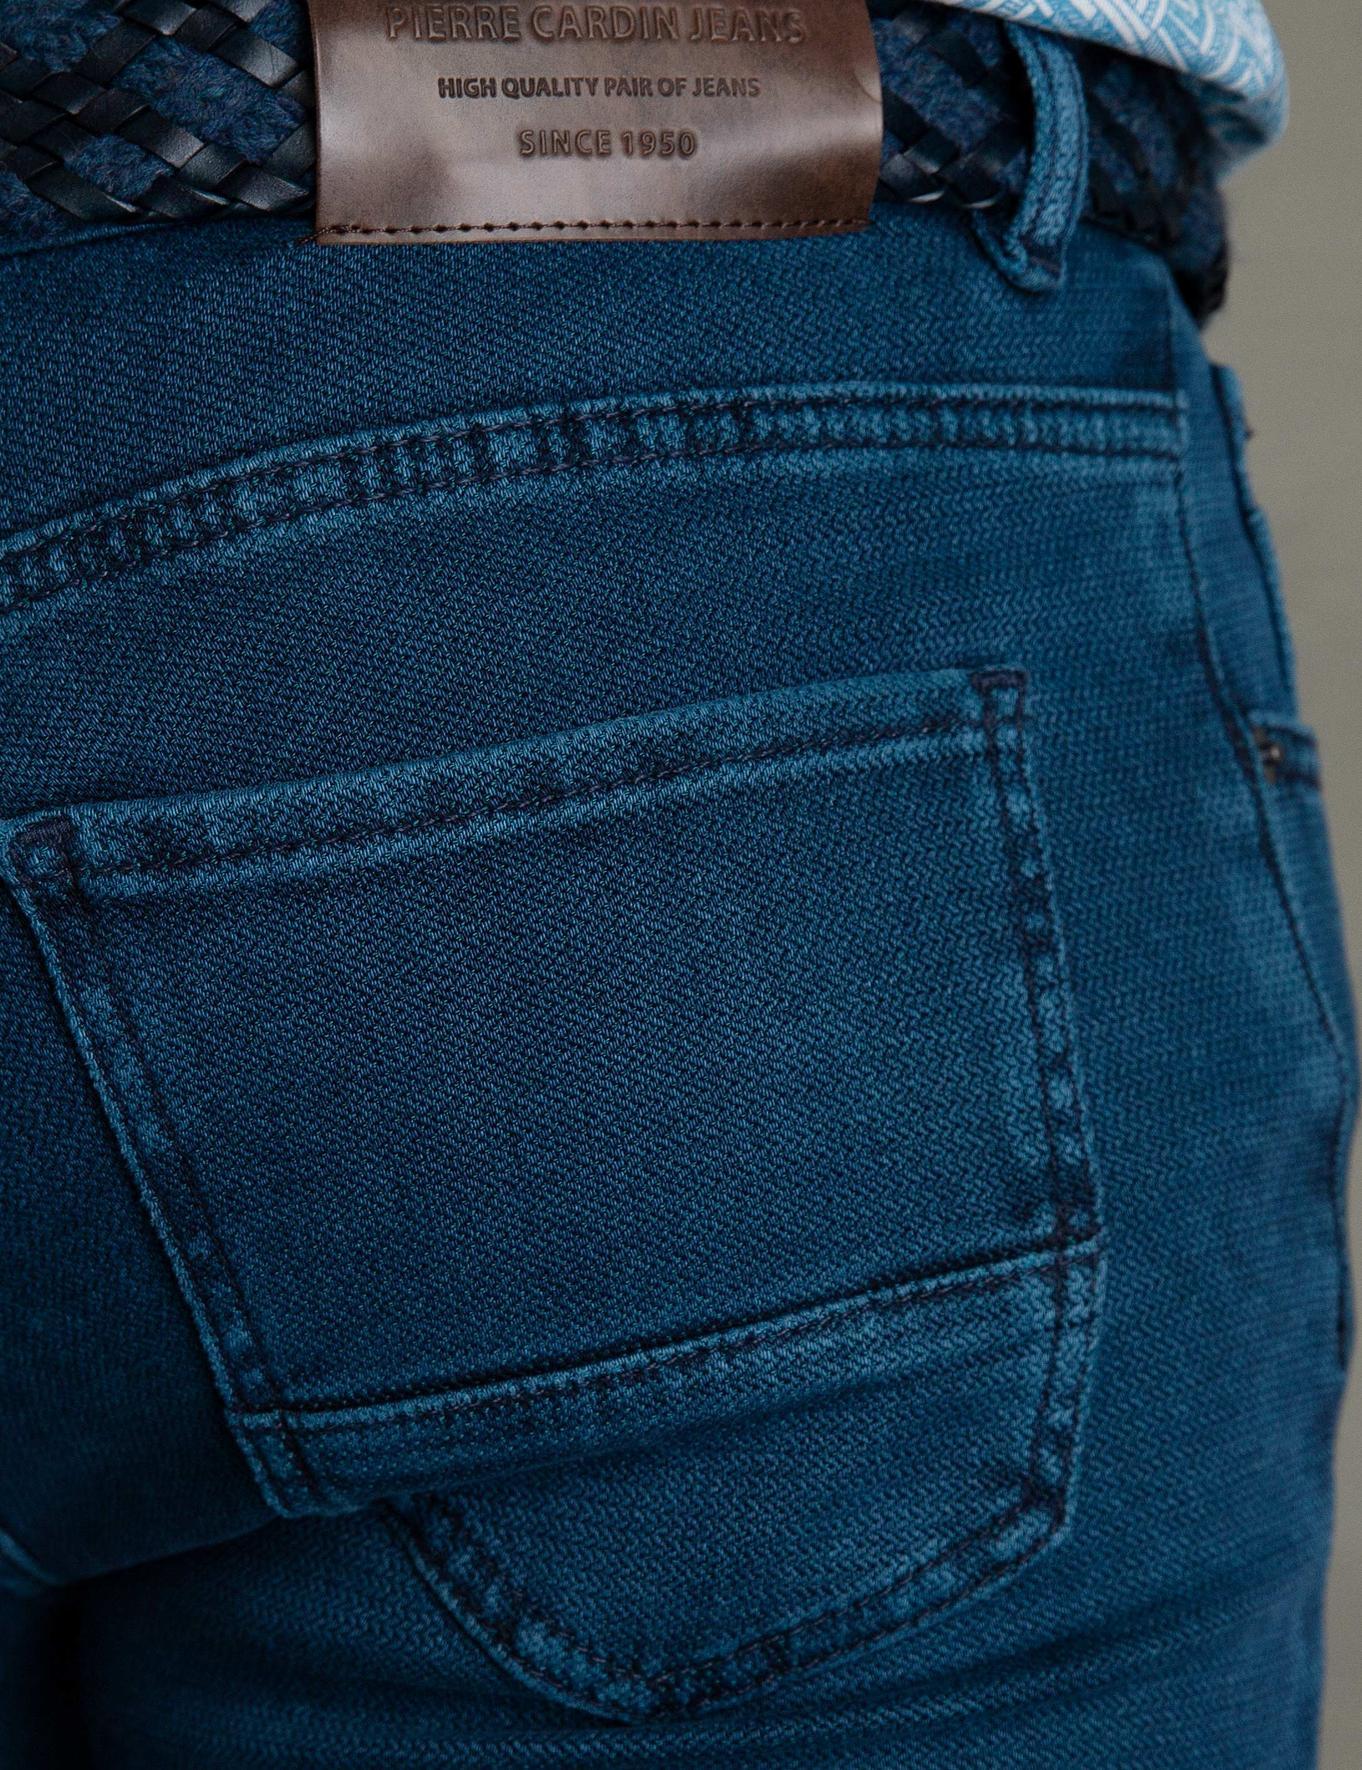 Açık Lacivert Denim Pantolon